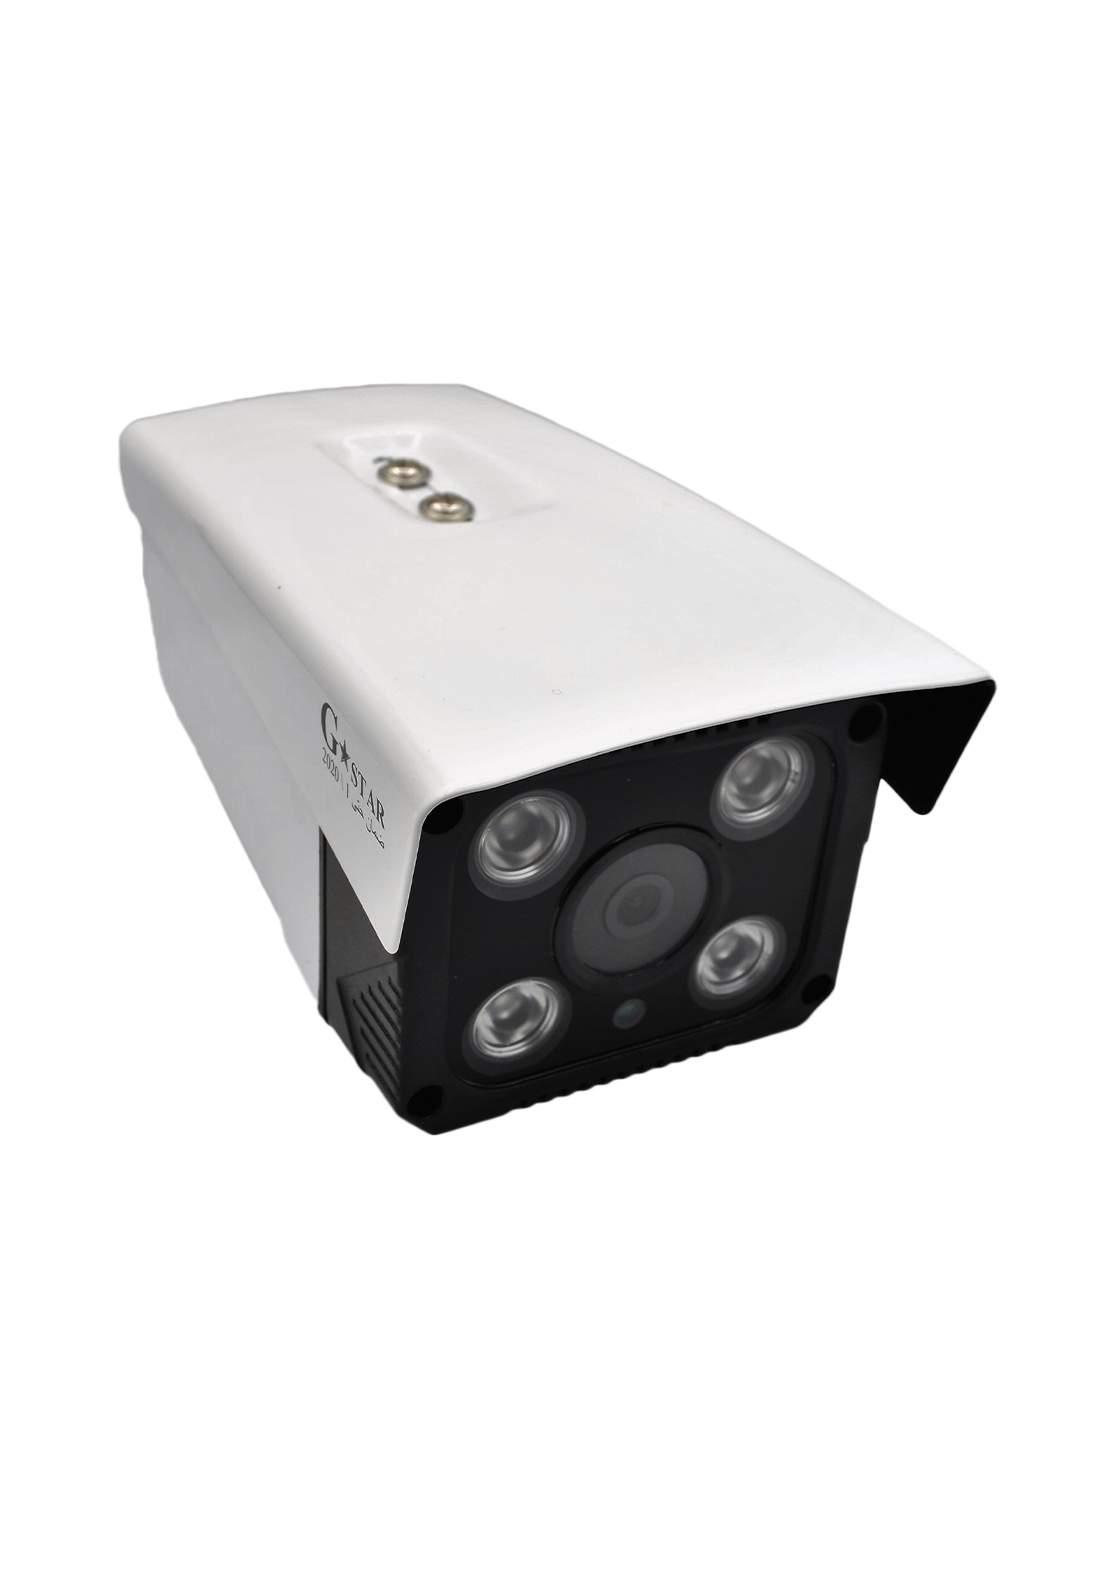 Gstar Analog High Definition Camera AHD 4MP  - White كاميرا مراقبة